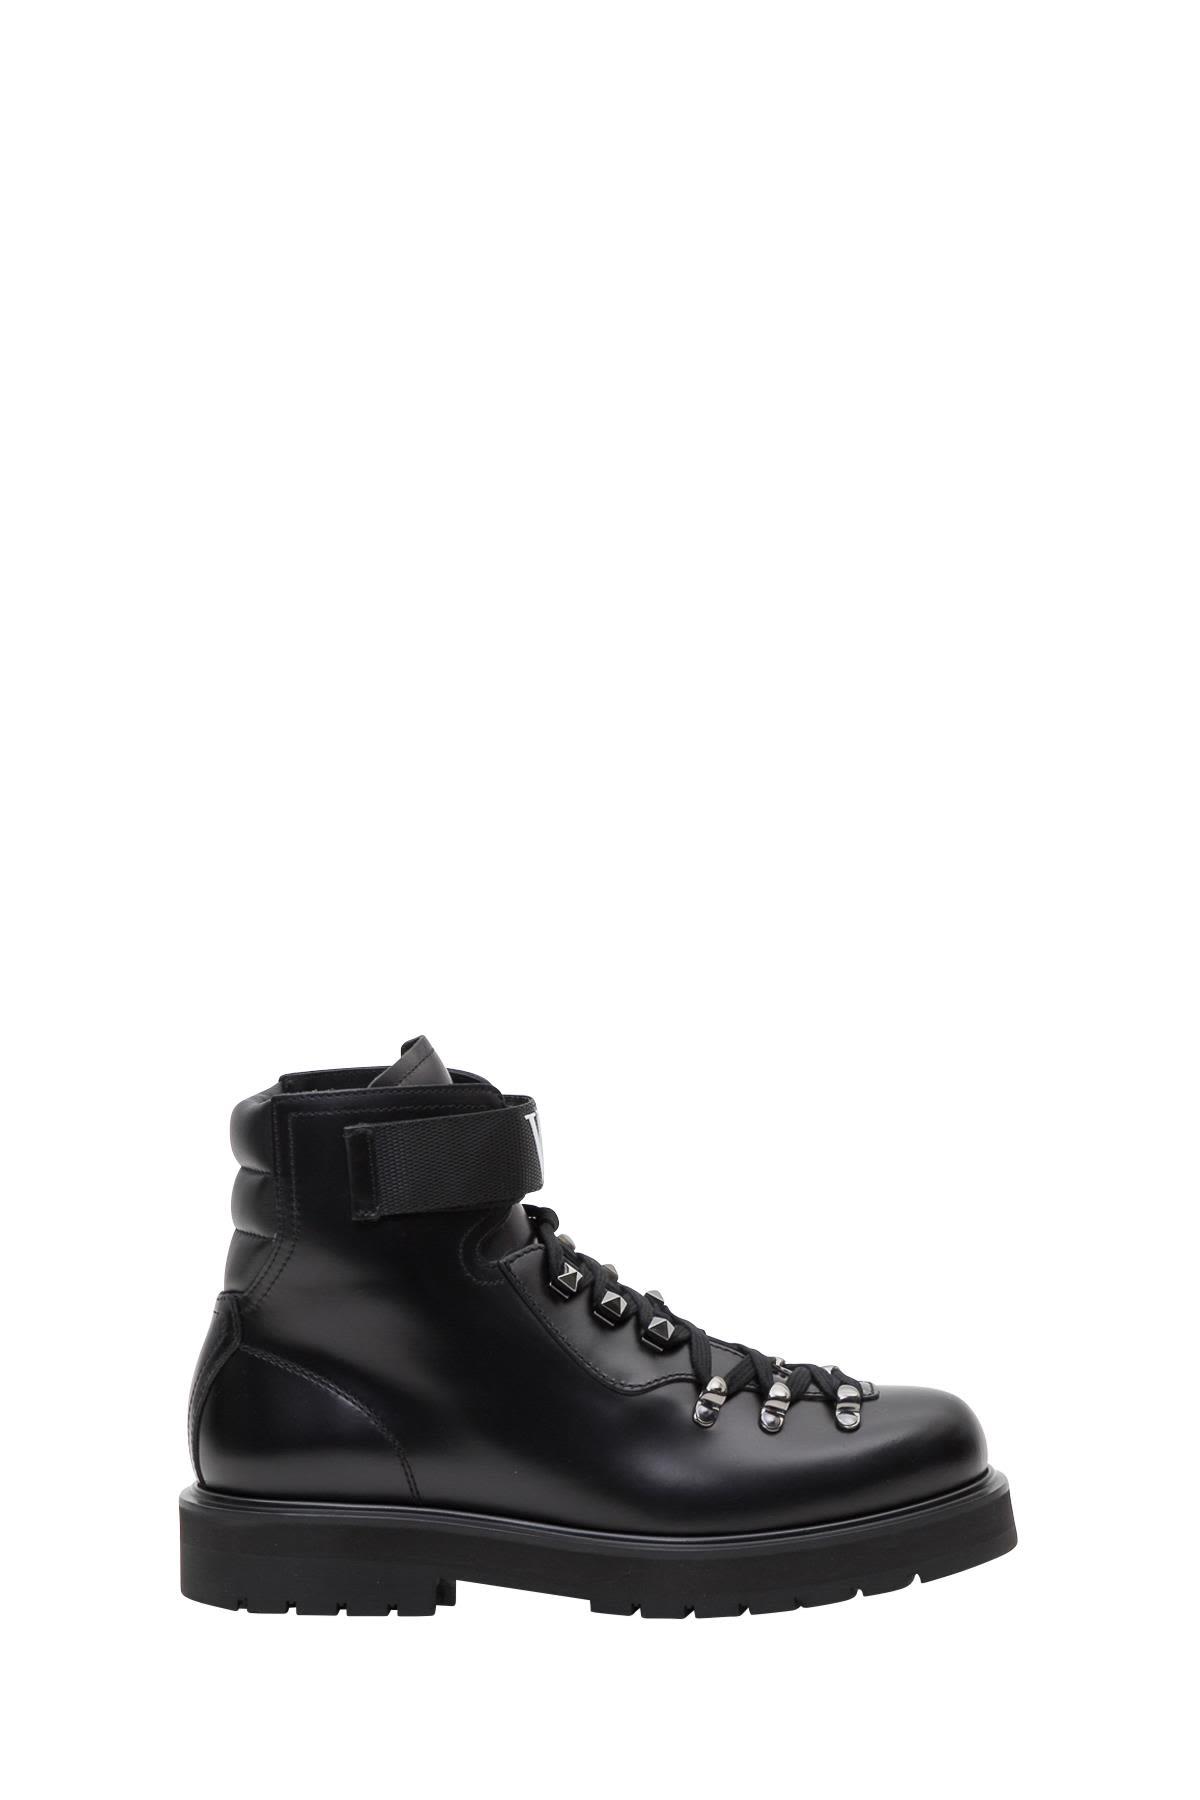 valentino garavani -  Vltn Leather Combat Boots